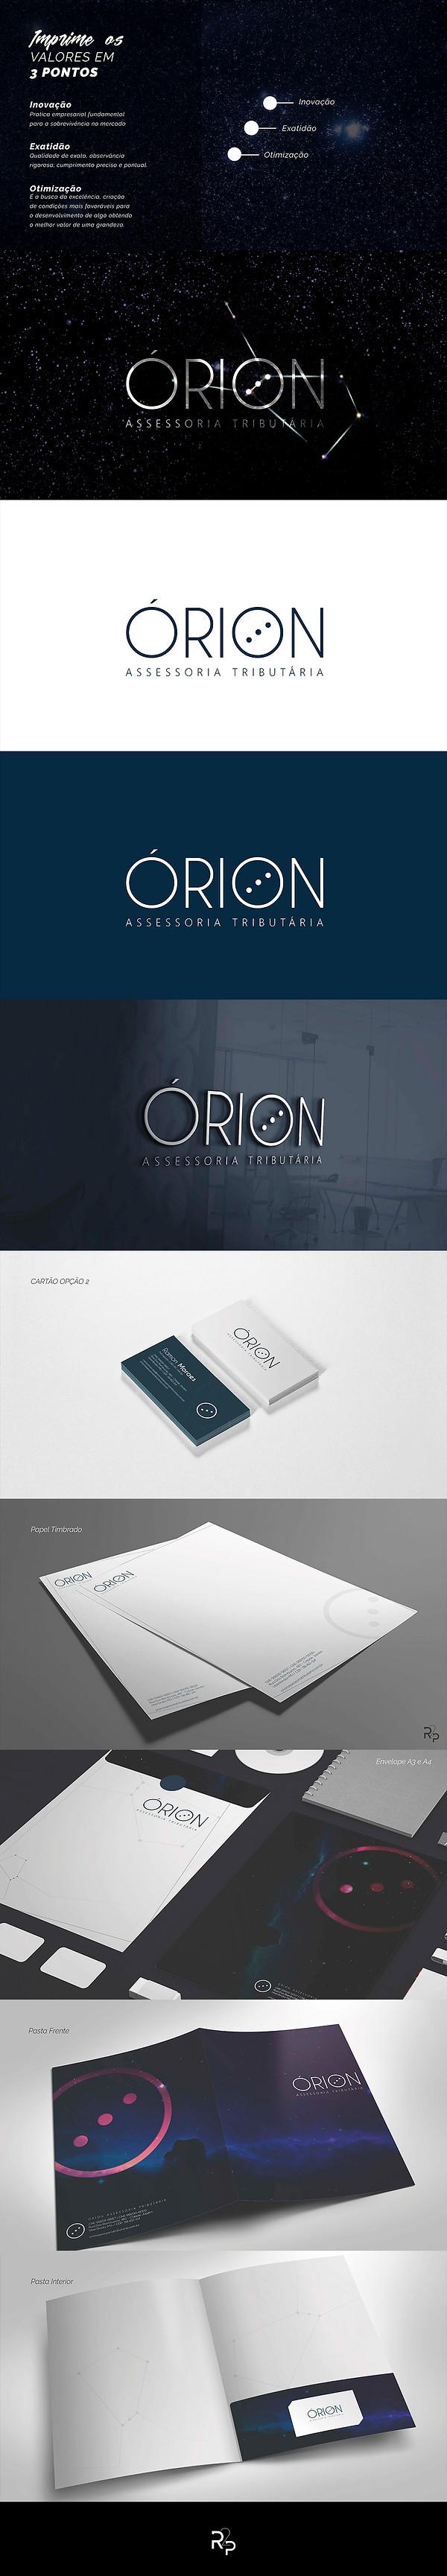 PARAPOST-ORION2.jpg